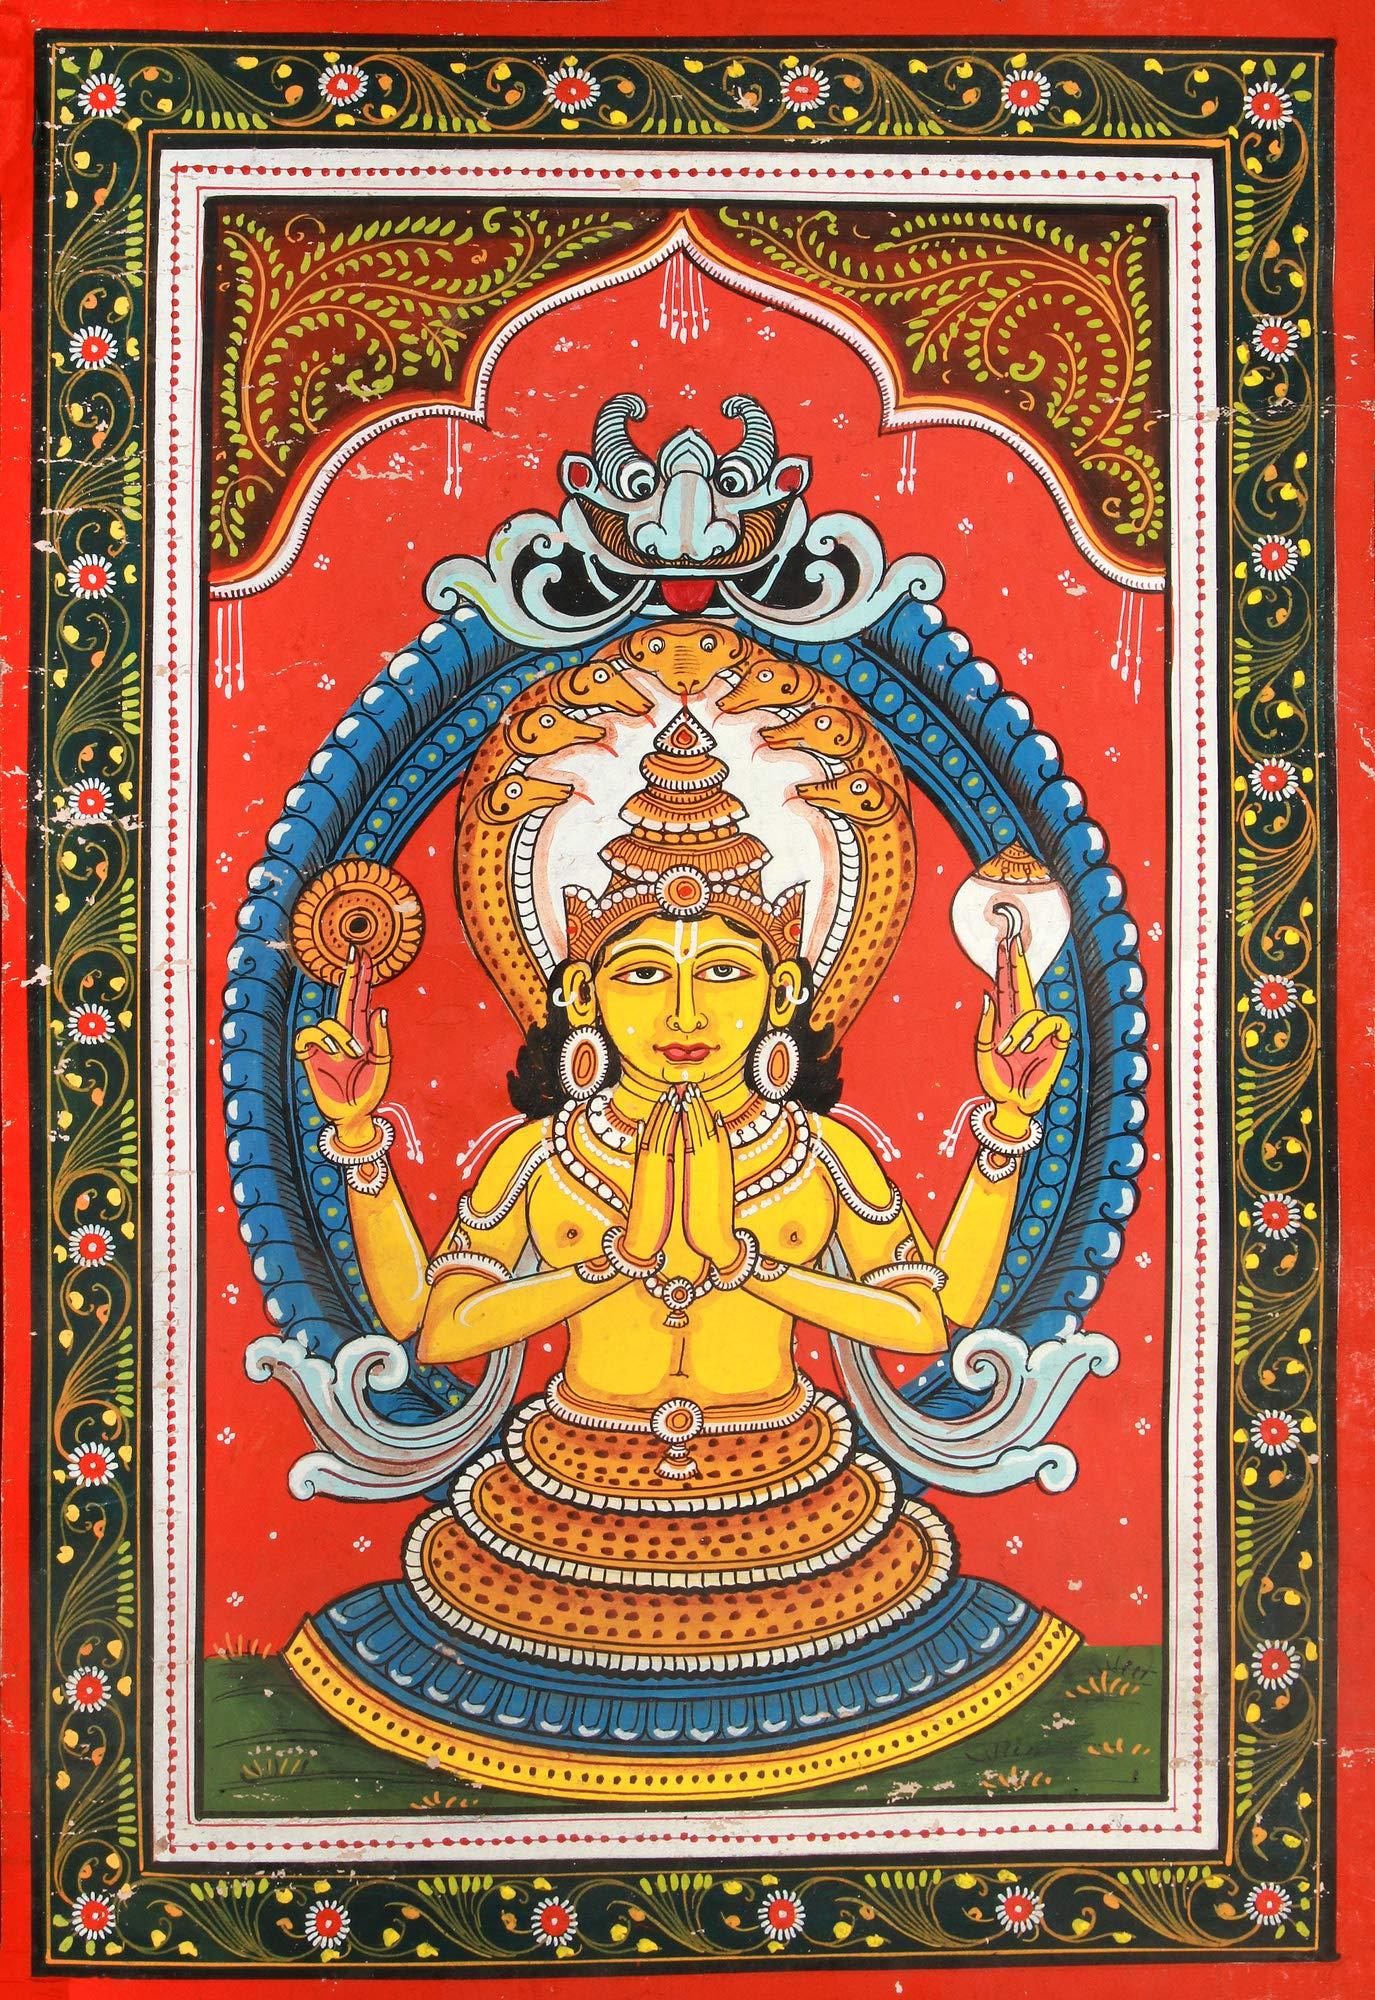 Exotic India Patanjali - Watercolor on Patti - Artist: Rabi Behera